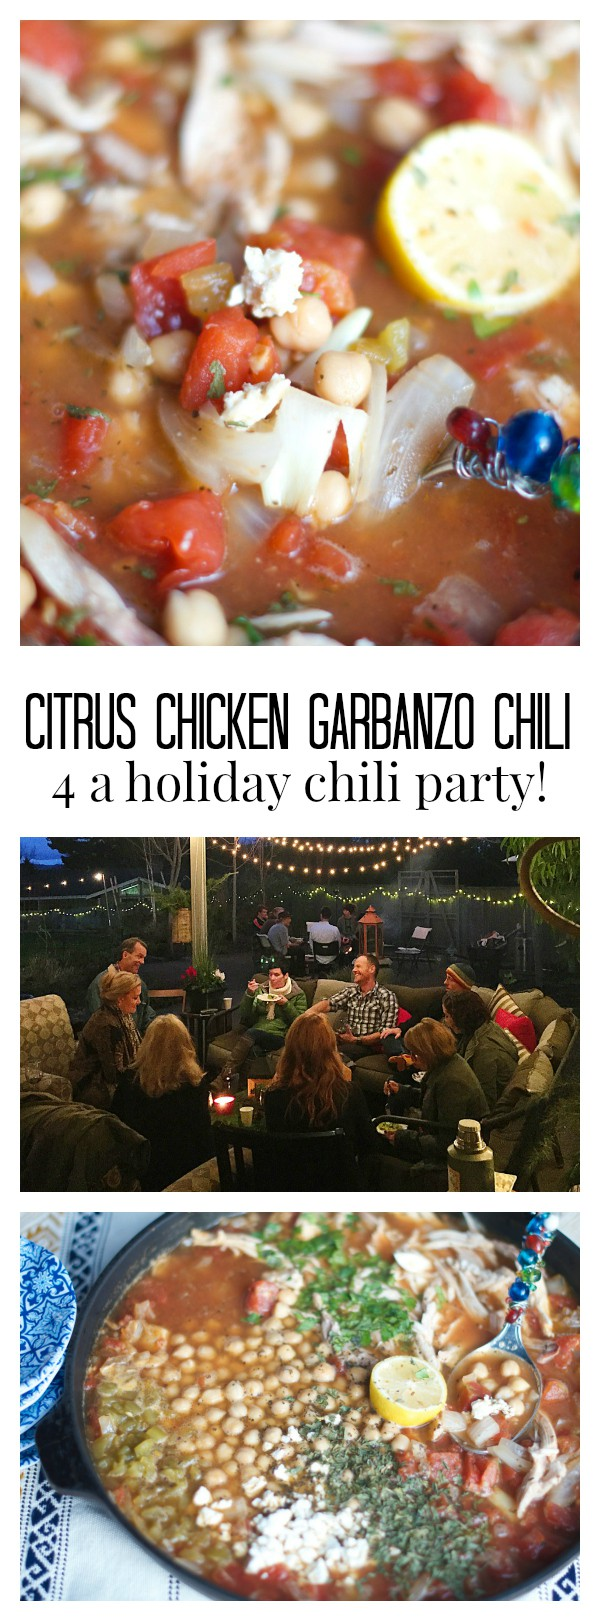 Citrus Chicken Garbanzo Chili for a Holiday Chili Party